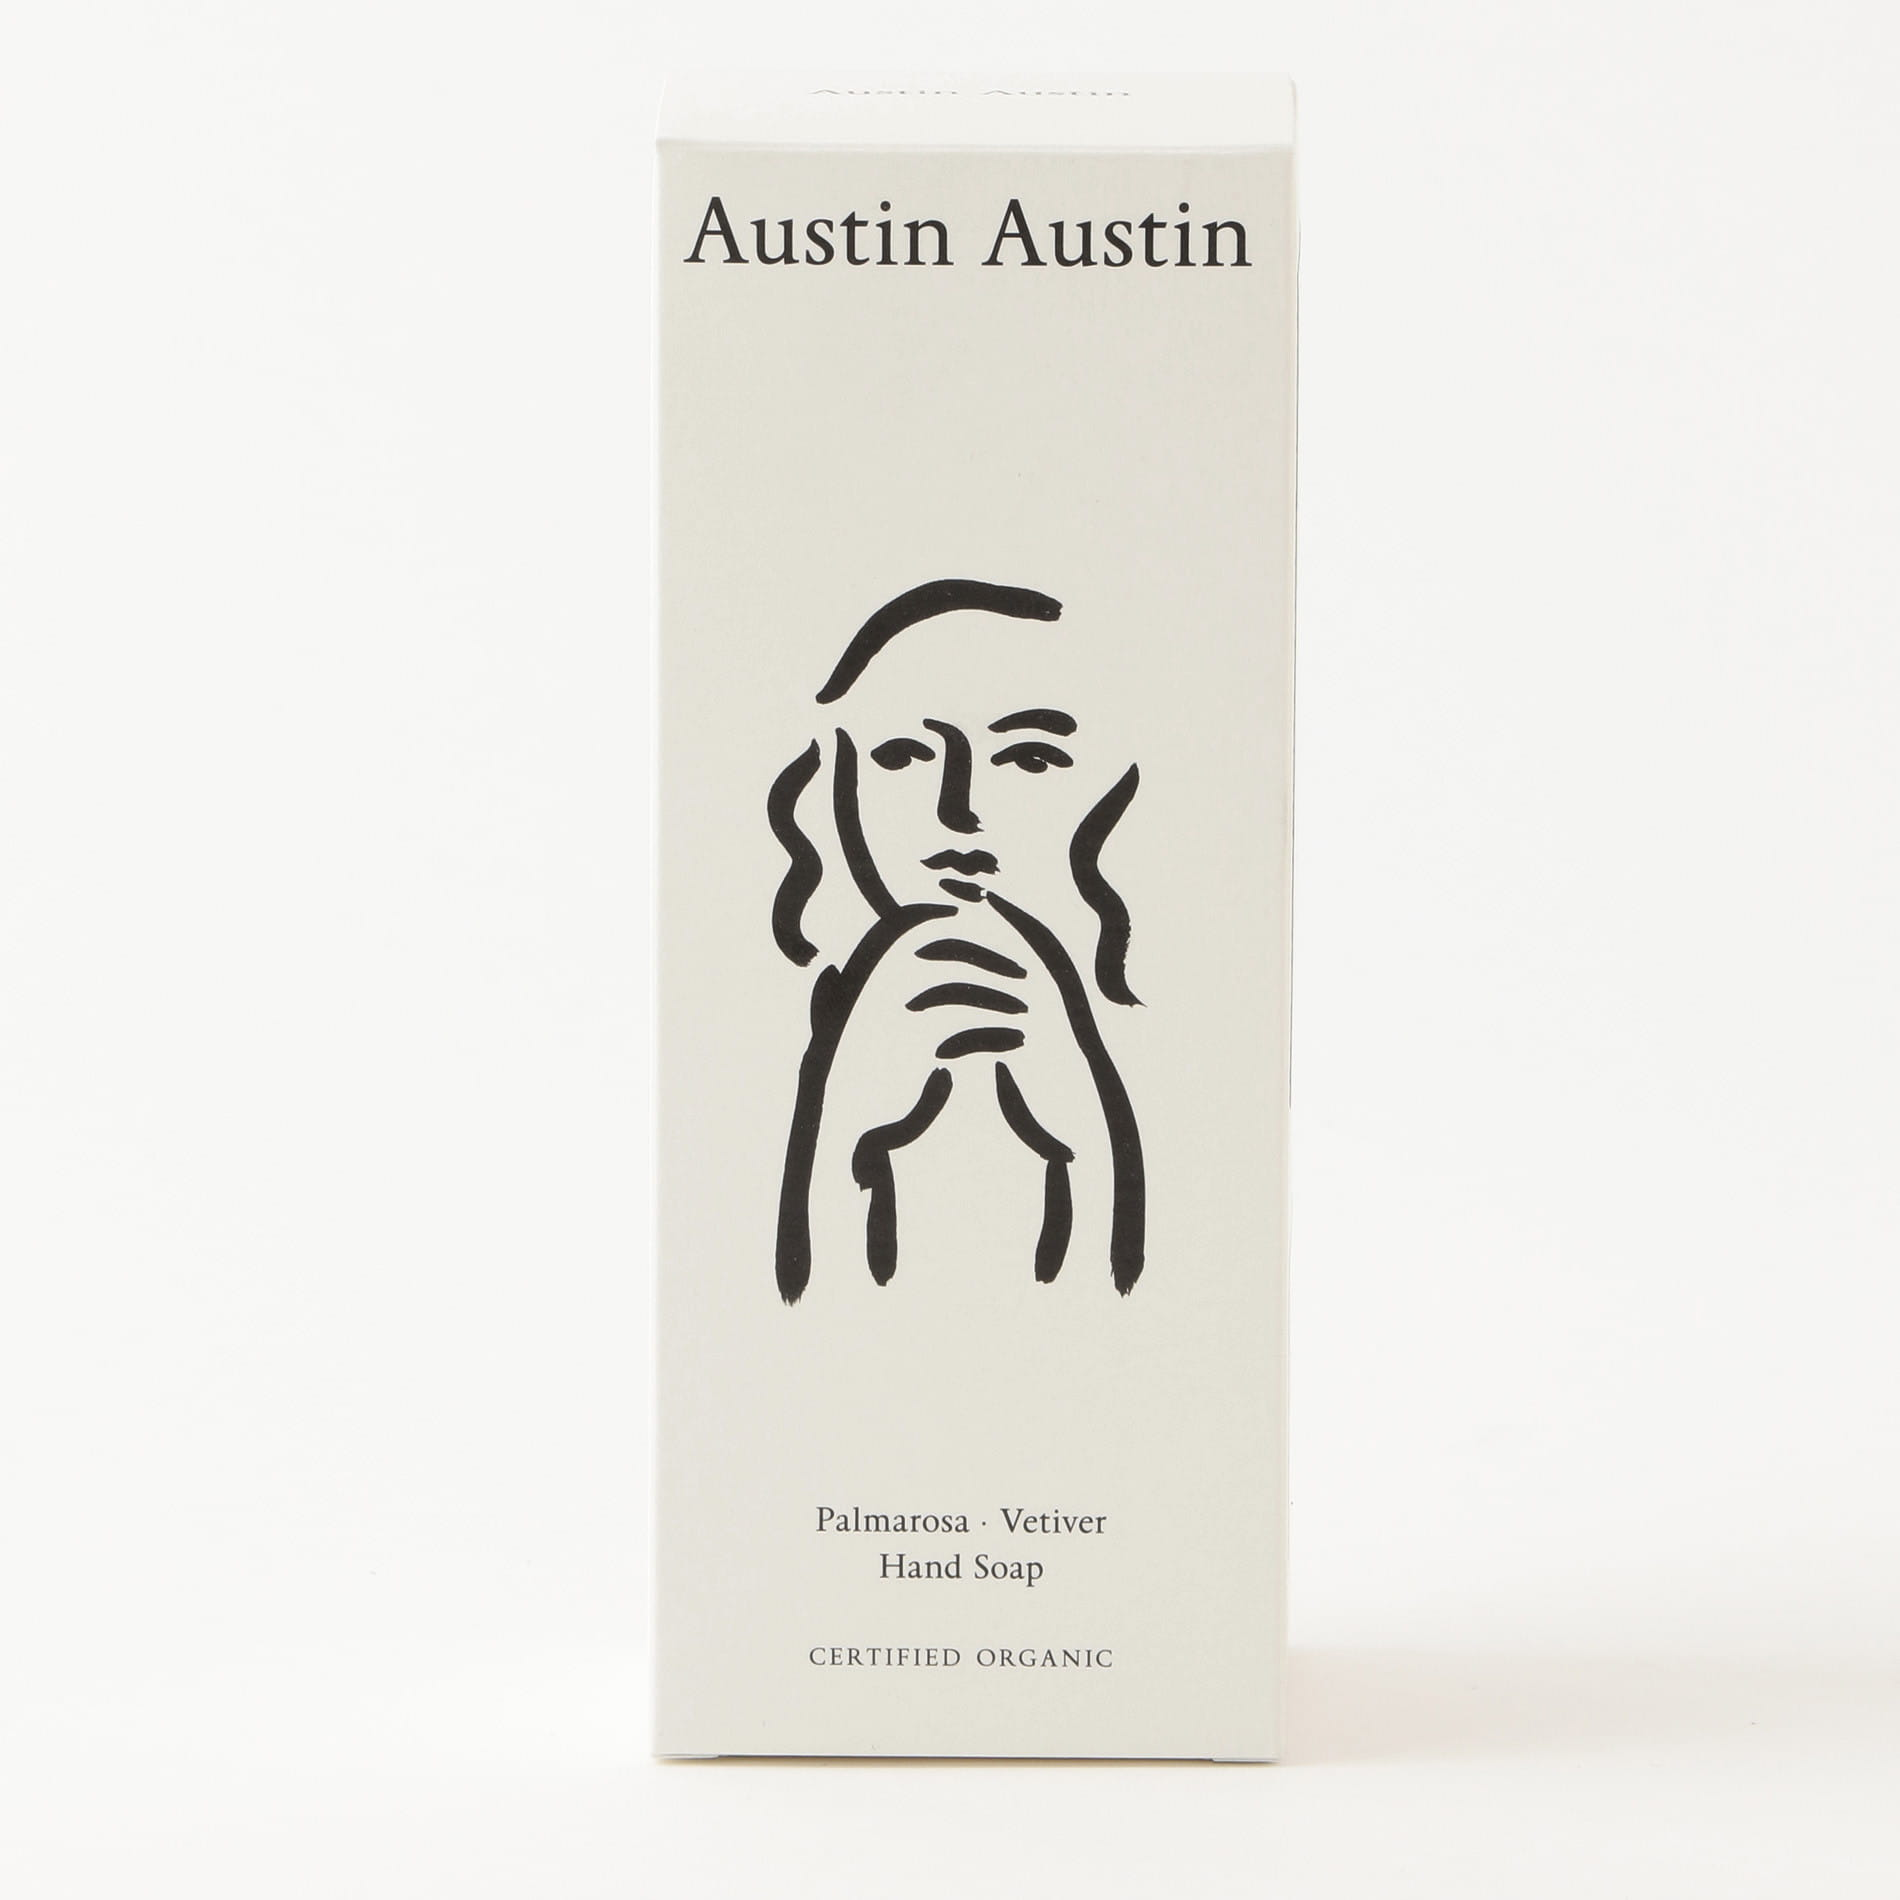 【Austin Austin】ハンドソープ MB03019A